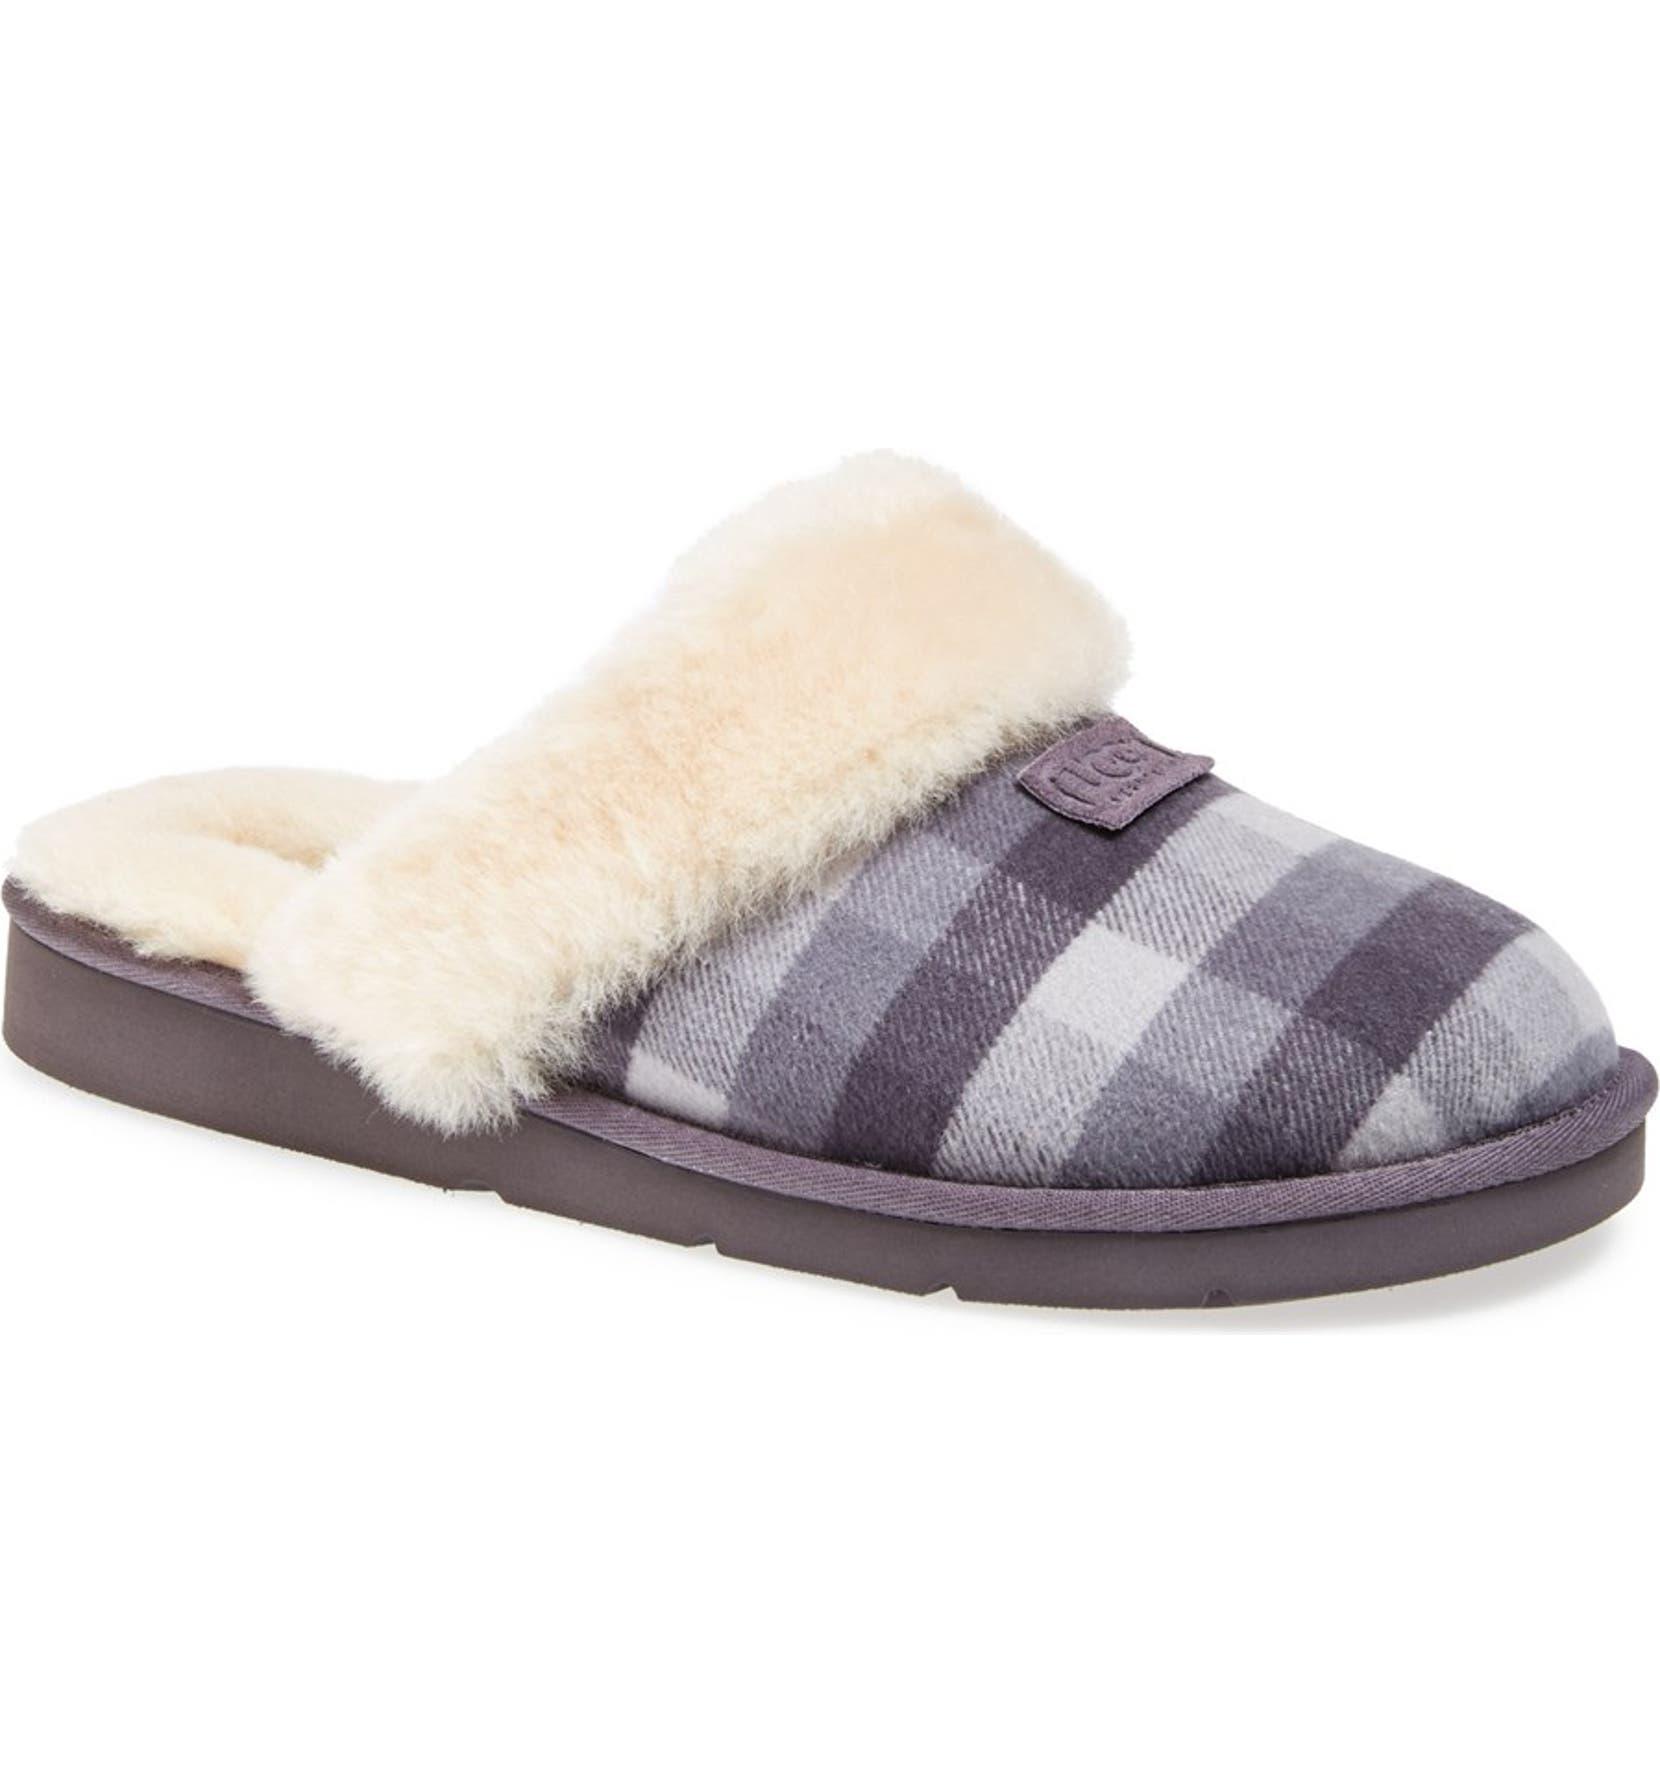 56e251dba UGG® Australia 'Cozy' Flannel Slipper (Women)   Nordstrom